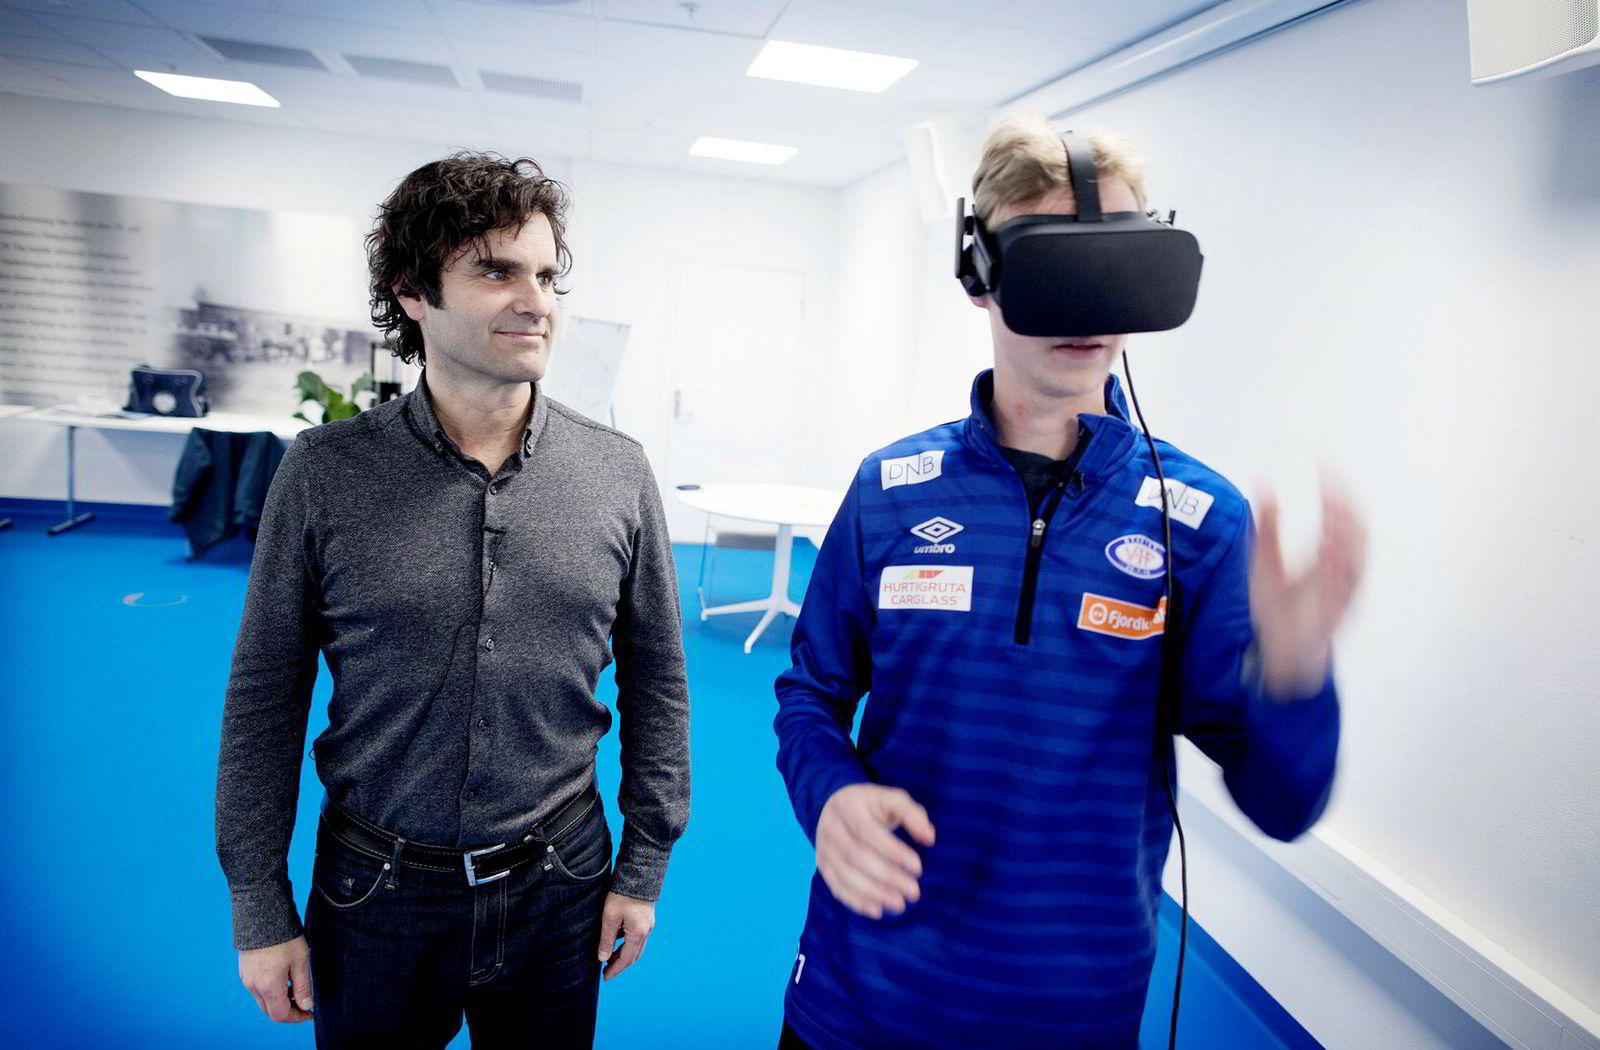 Odd Skarheim (til venstre) passer på når Sakarias Opsahl tar på VR-brillene.